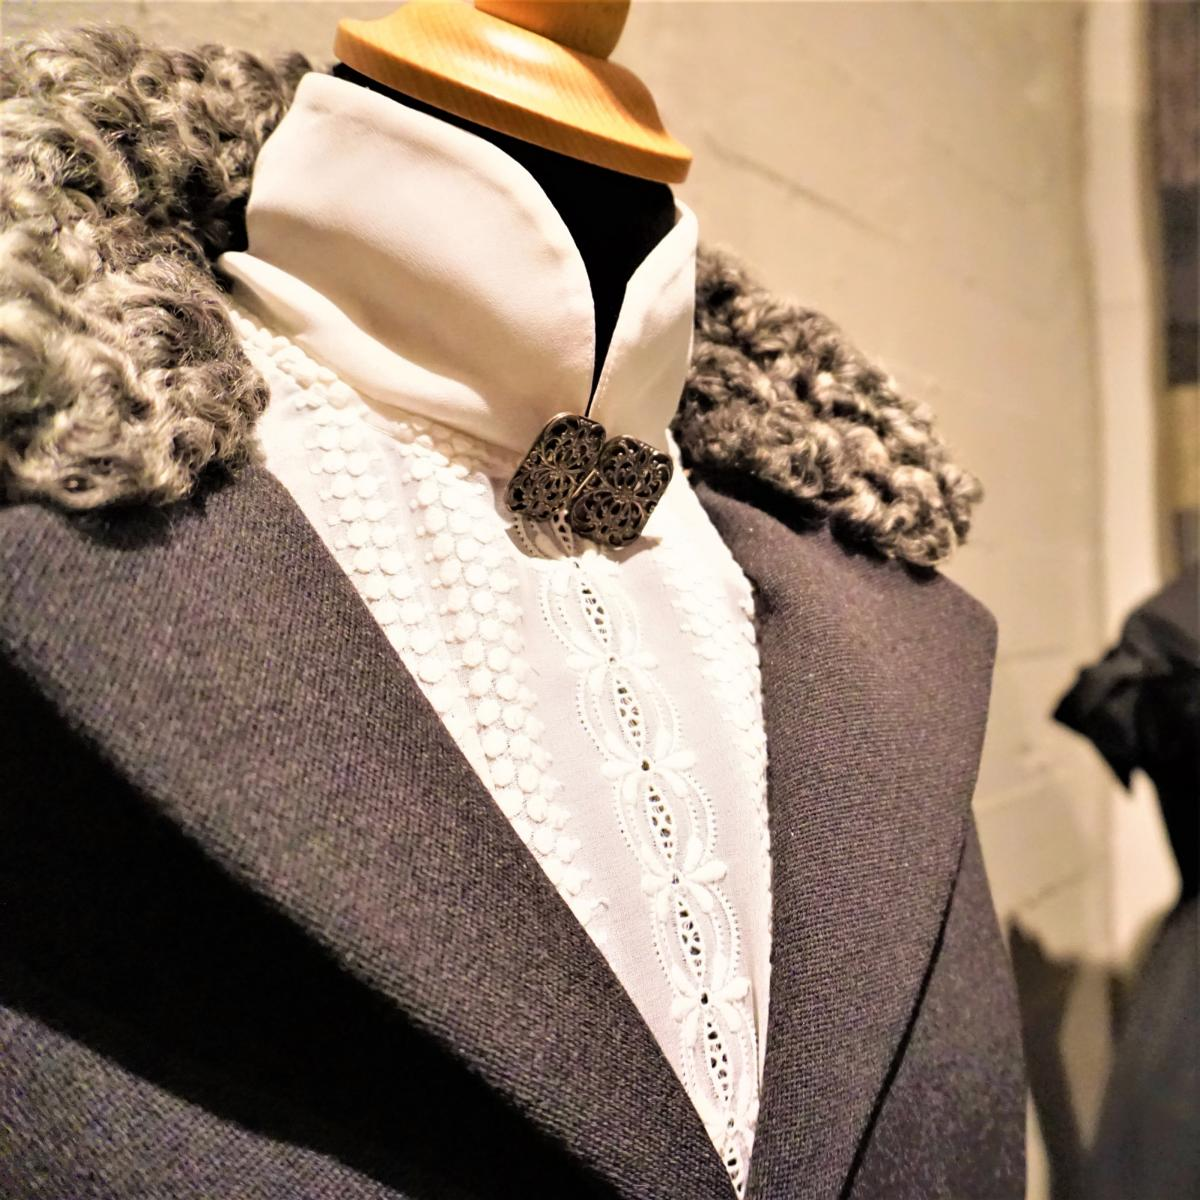 Style Hannover Museum für textile Kunst B - Museum für Textile Kunst: Tipp für echte Fashionfans